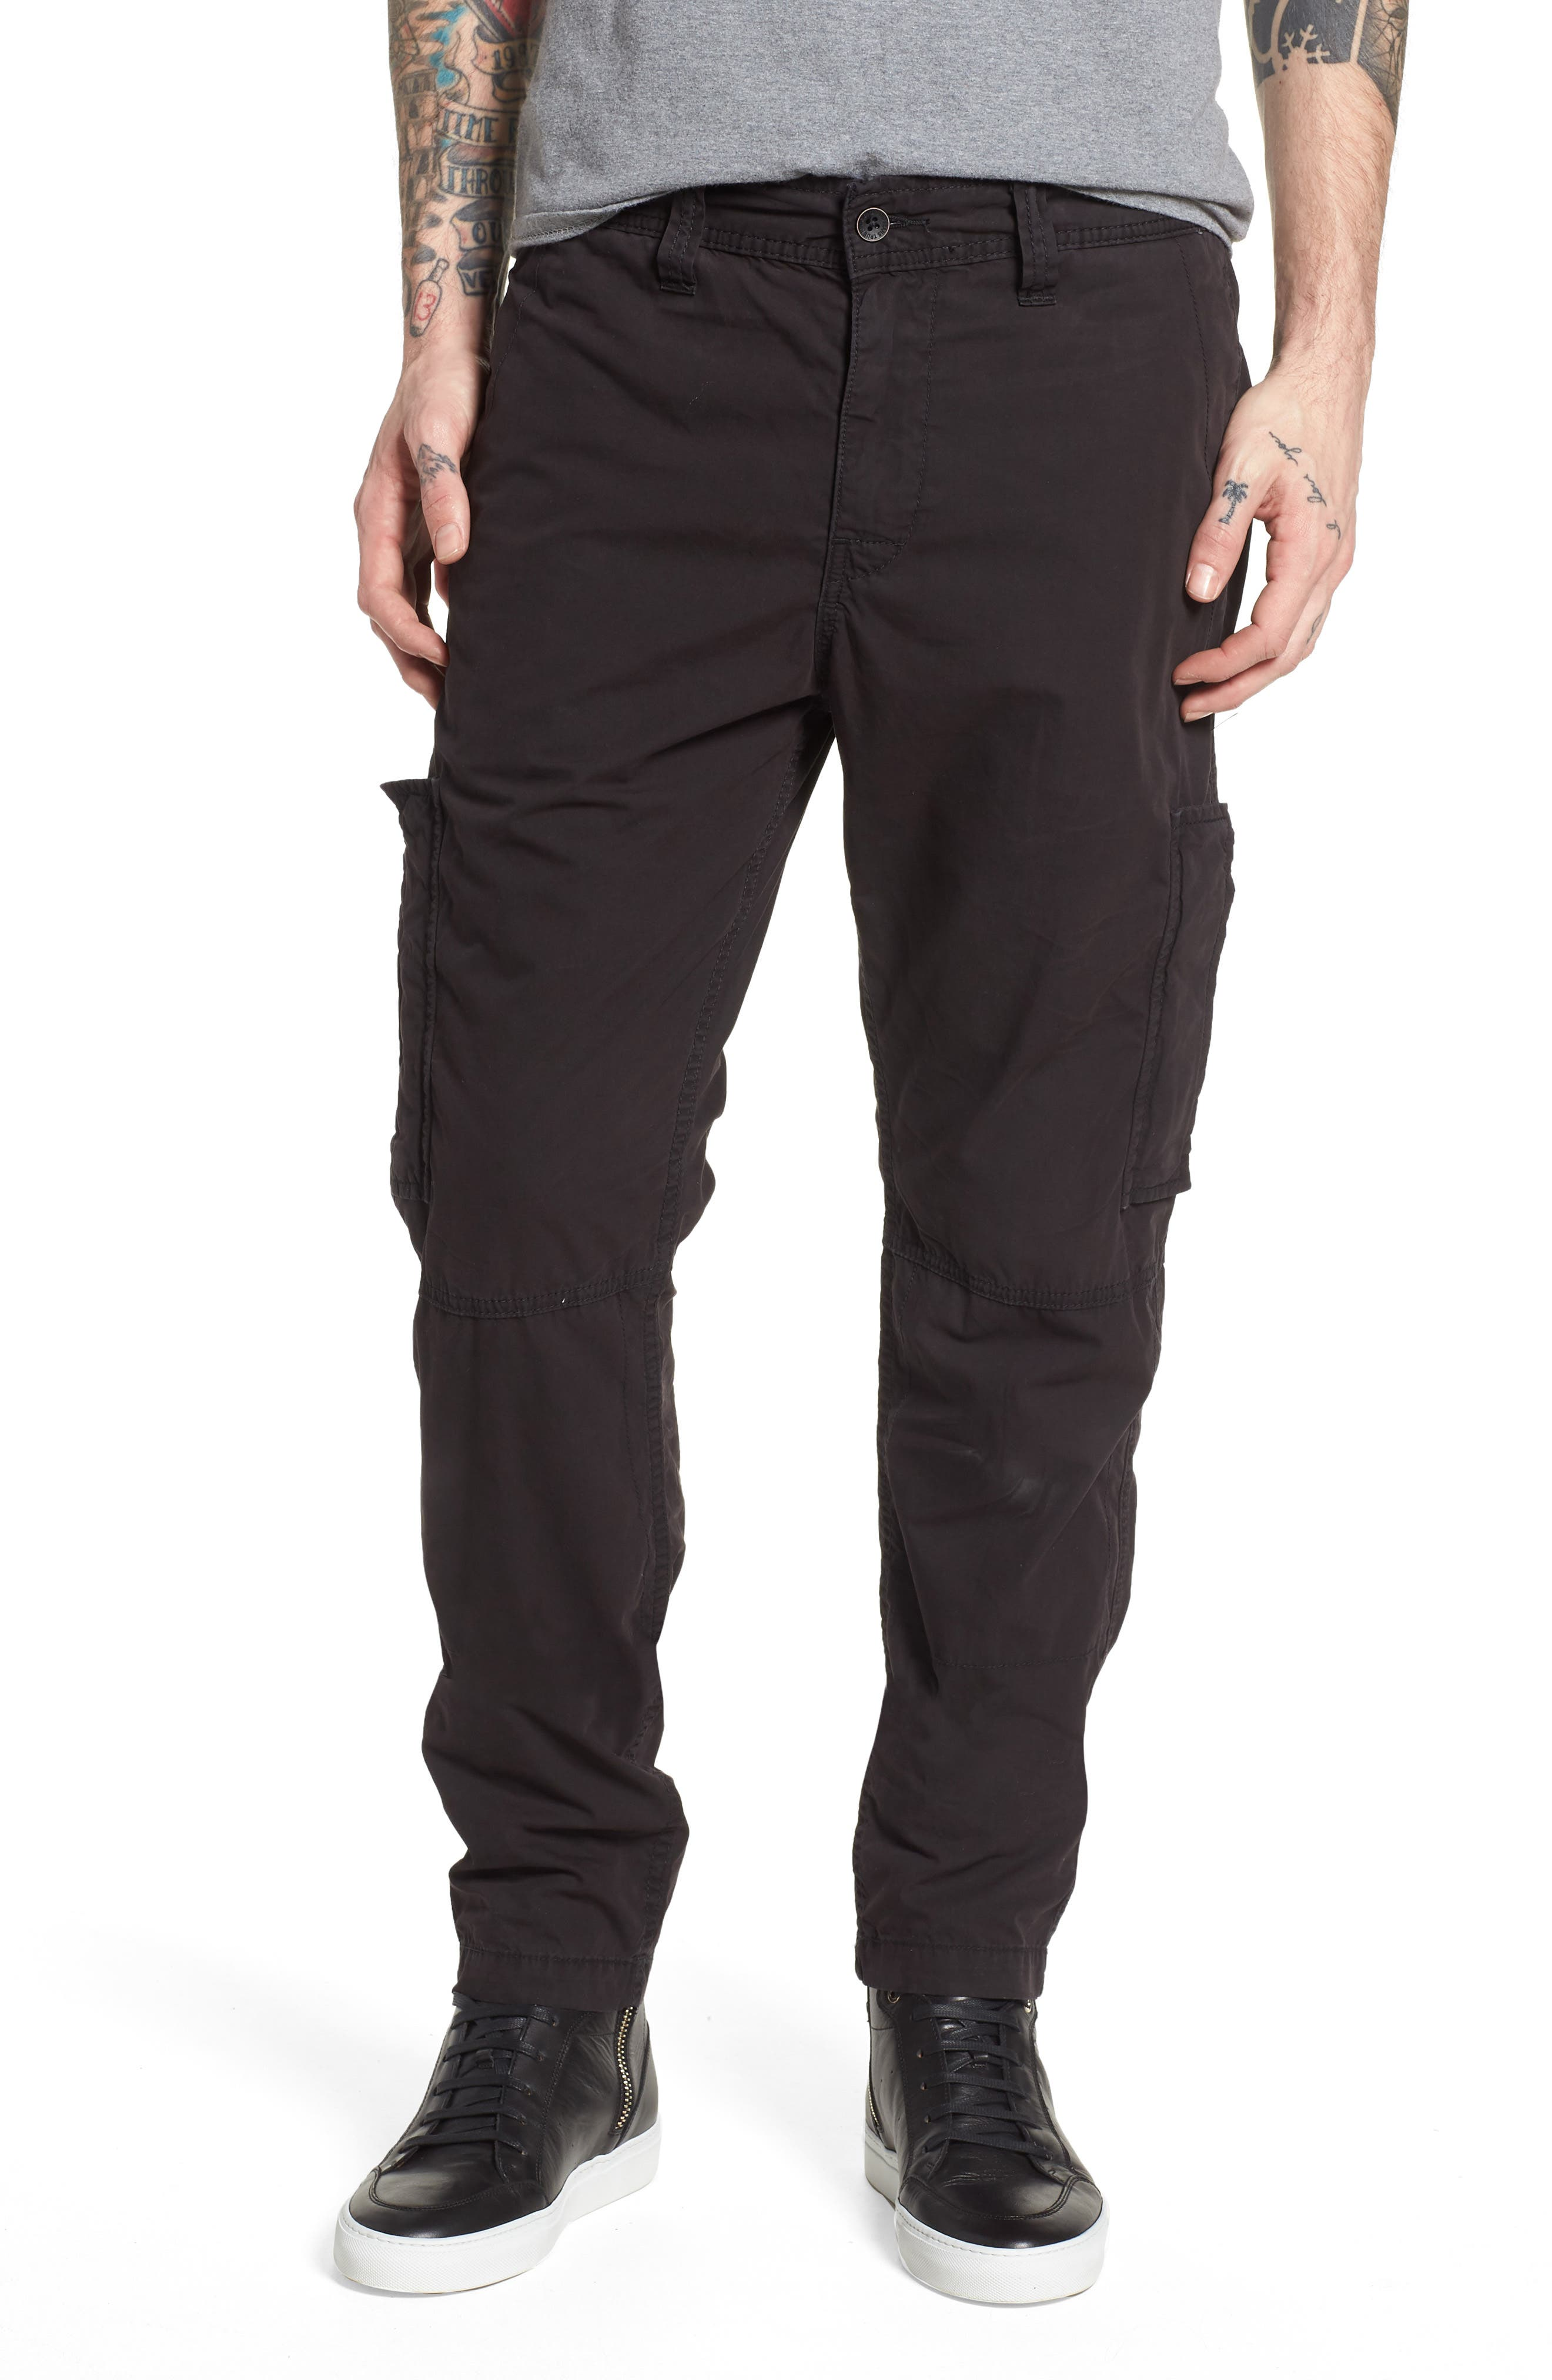 Officer Field Pants,                         Main,                         color, Black